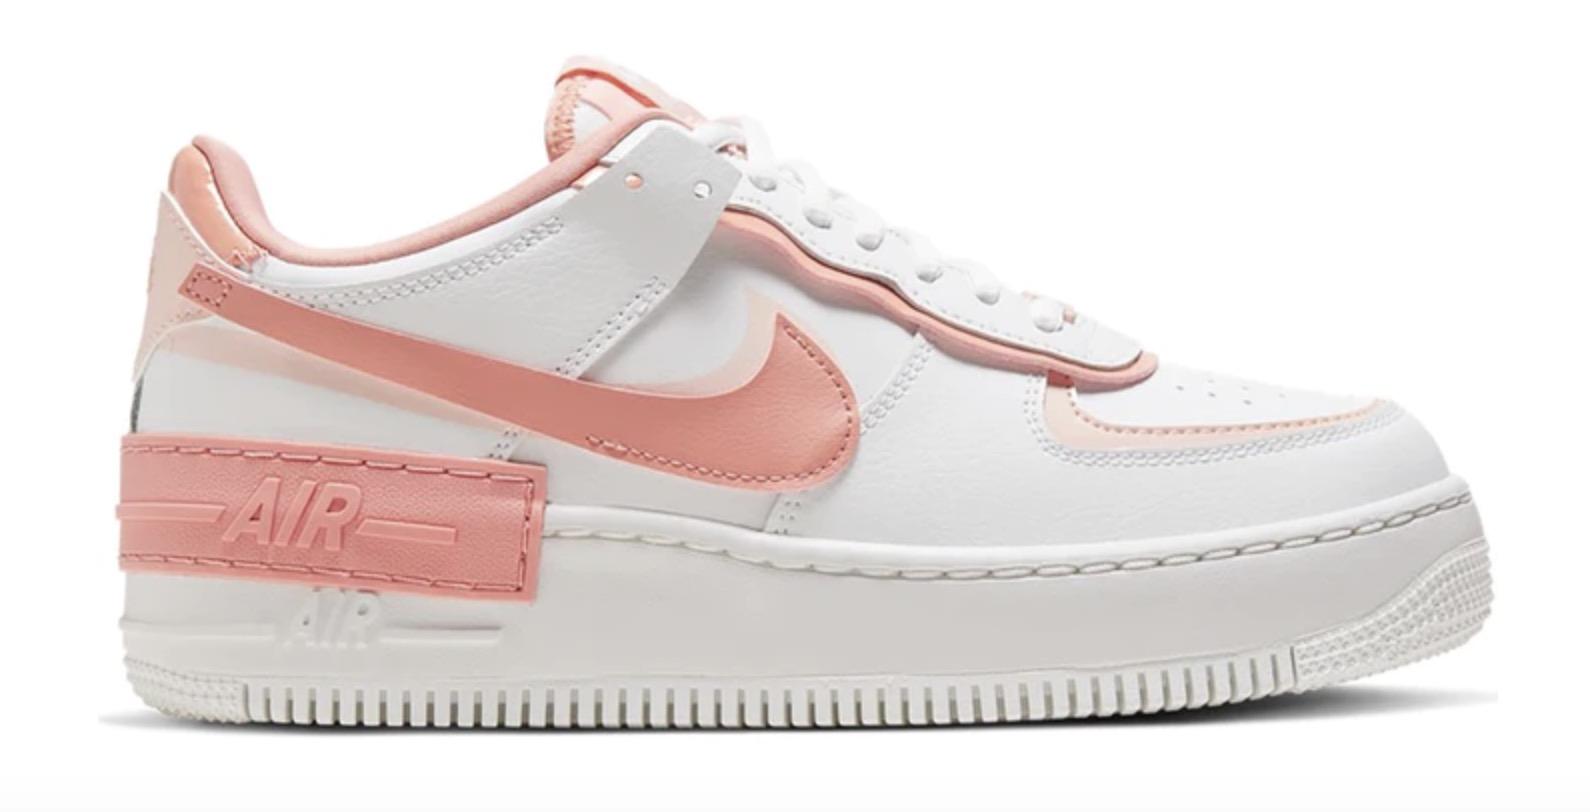 Nike Air Force 1 Shadow White Pastel Pink